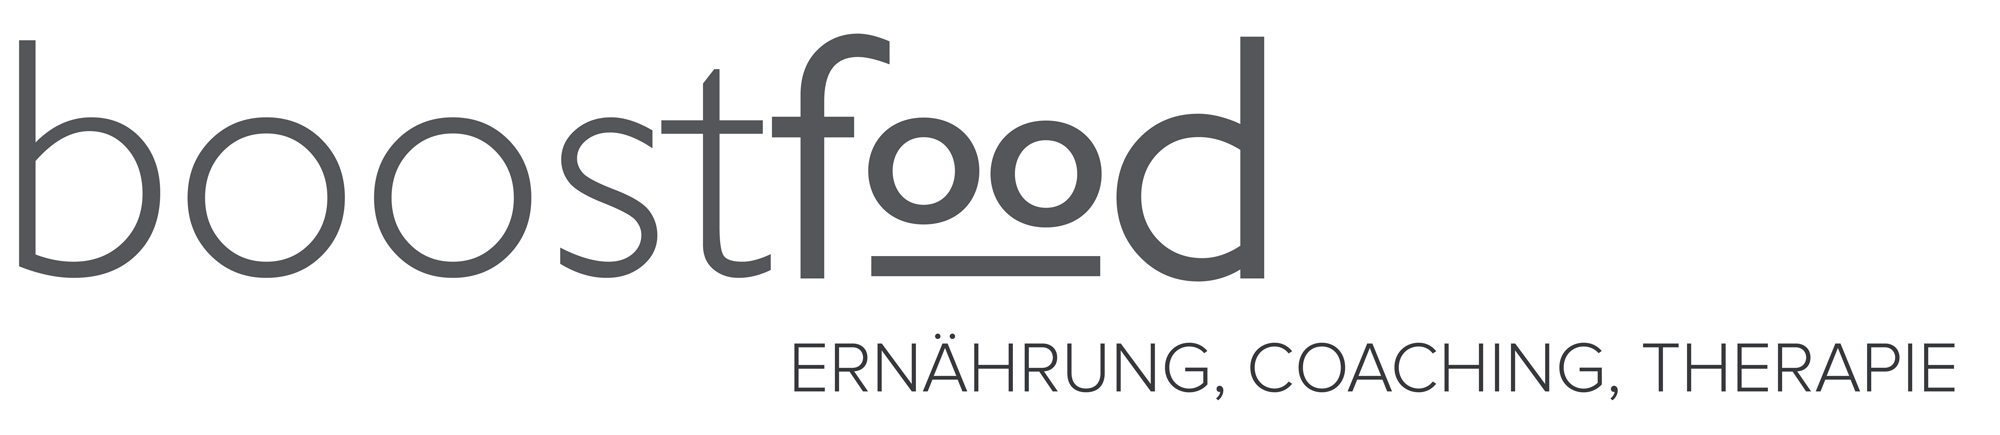 boostfood